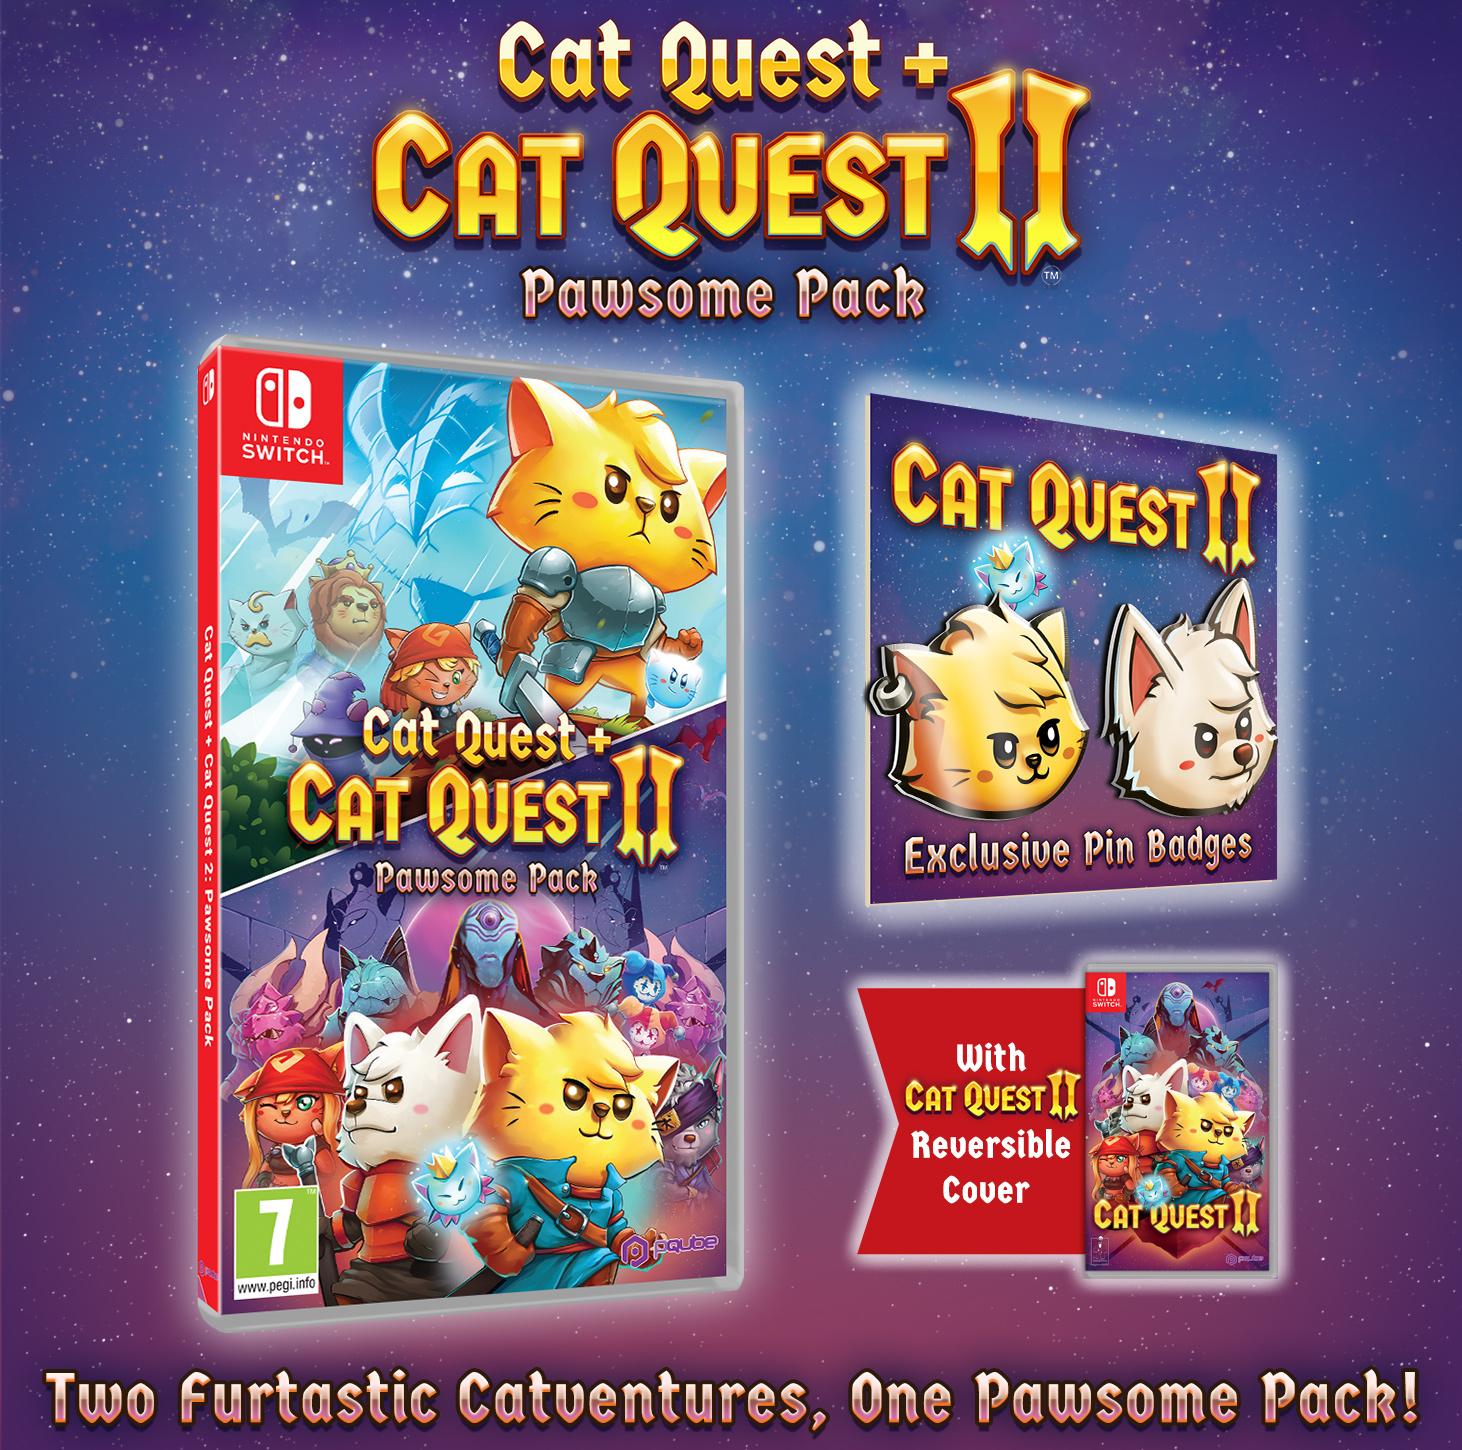 Cat Quest Pawsome Pack